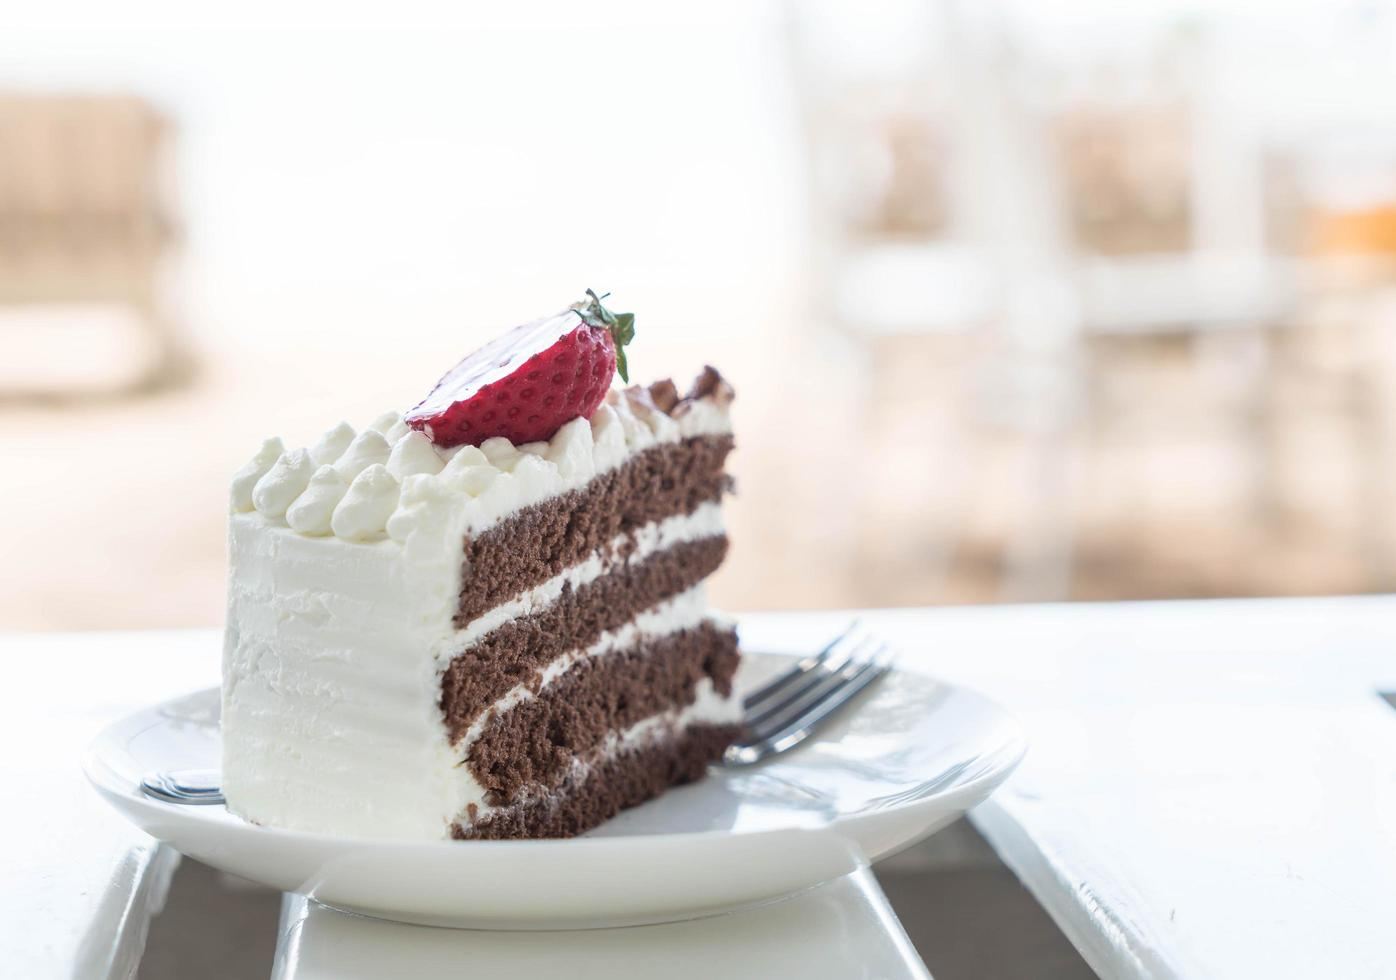 Vanilla and chocolate cake with strawberry photo